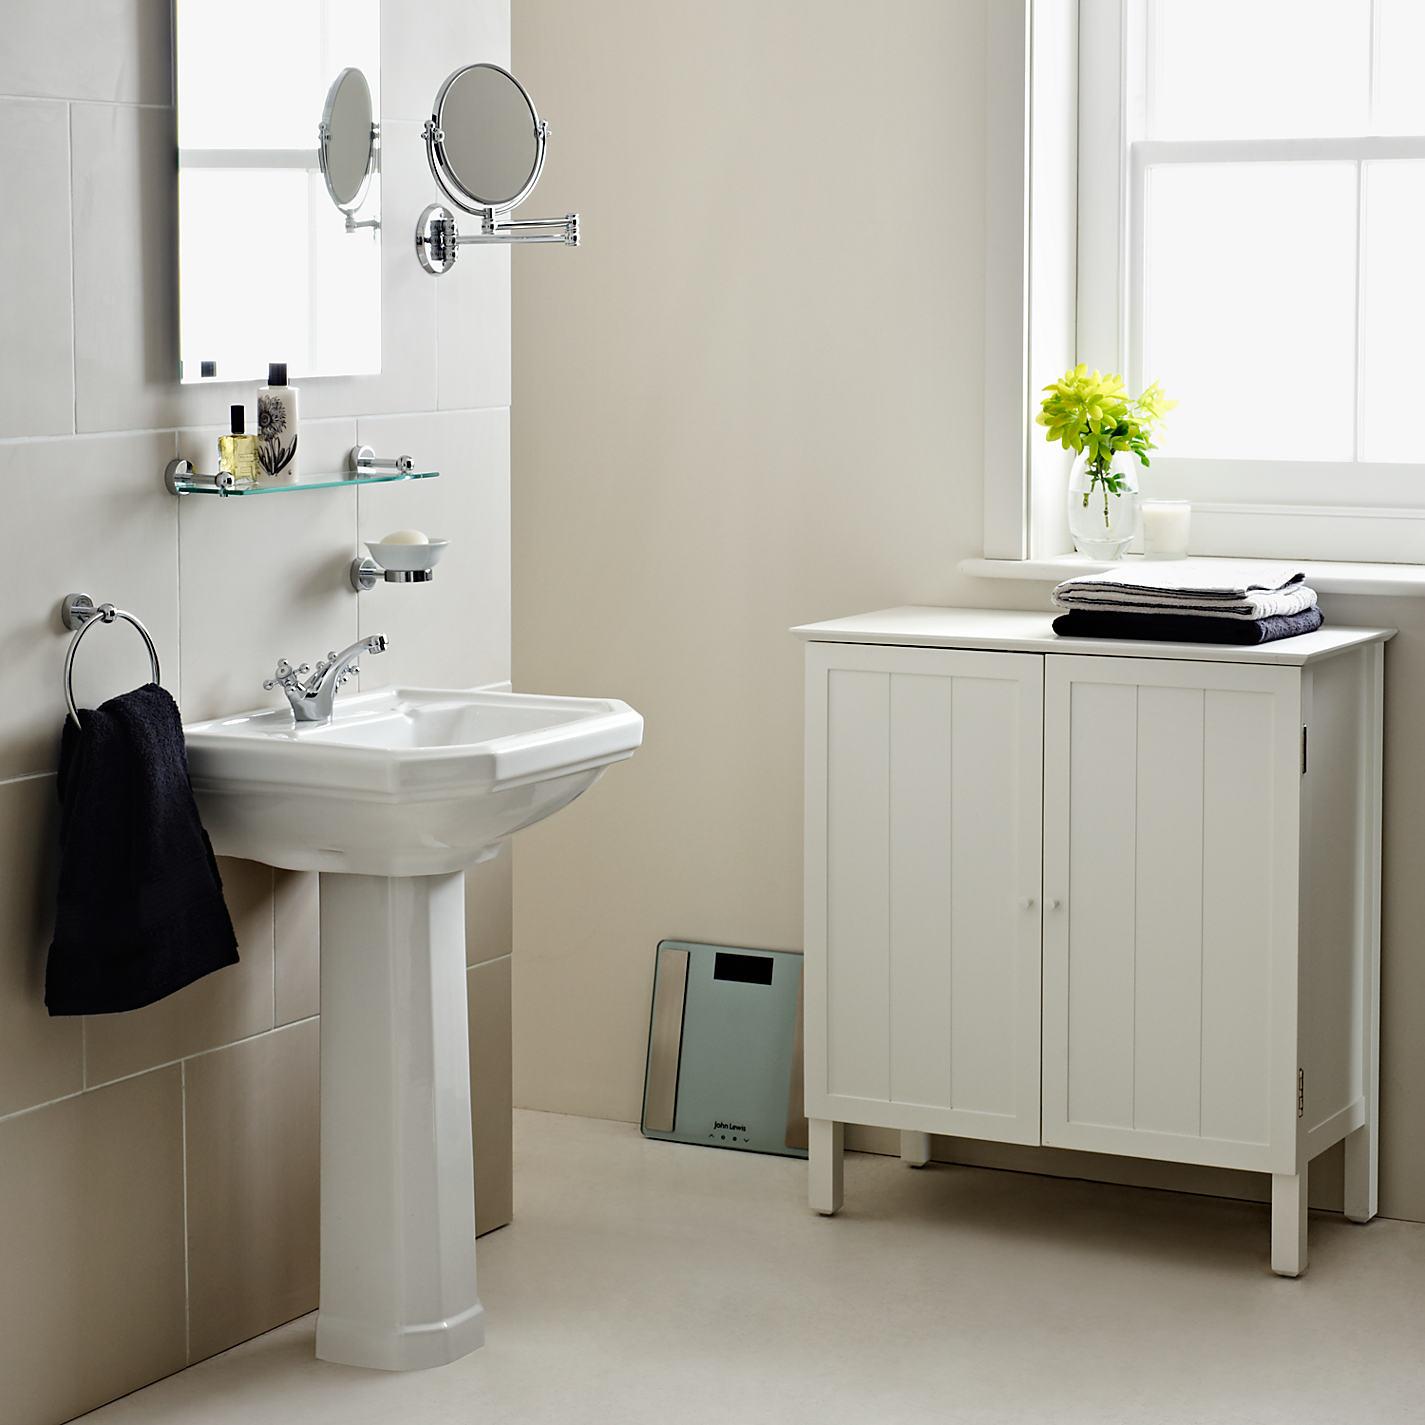 John Lewis St Ives Double Towel Cupboard Online At Johnlewis